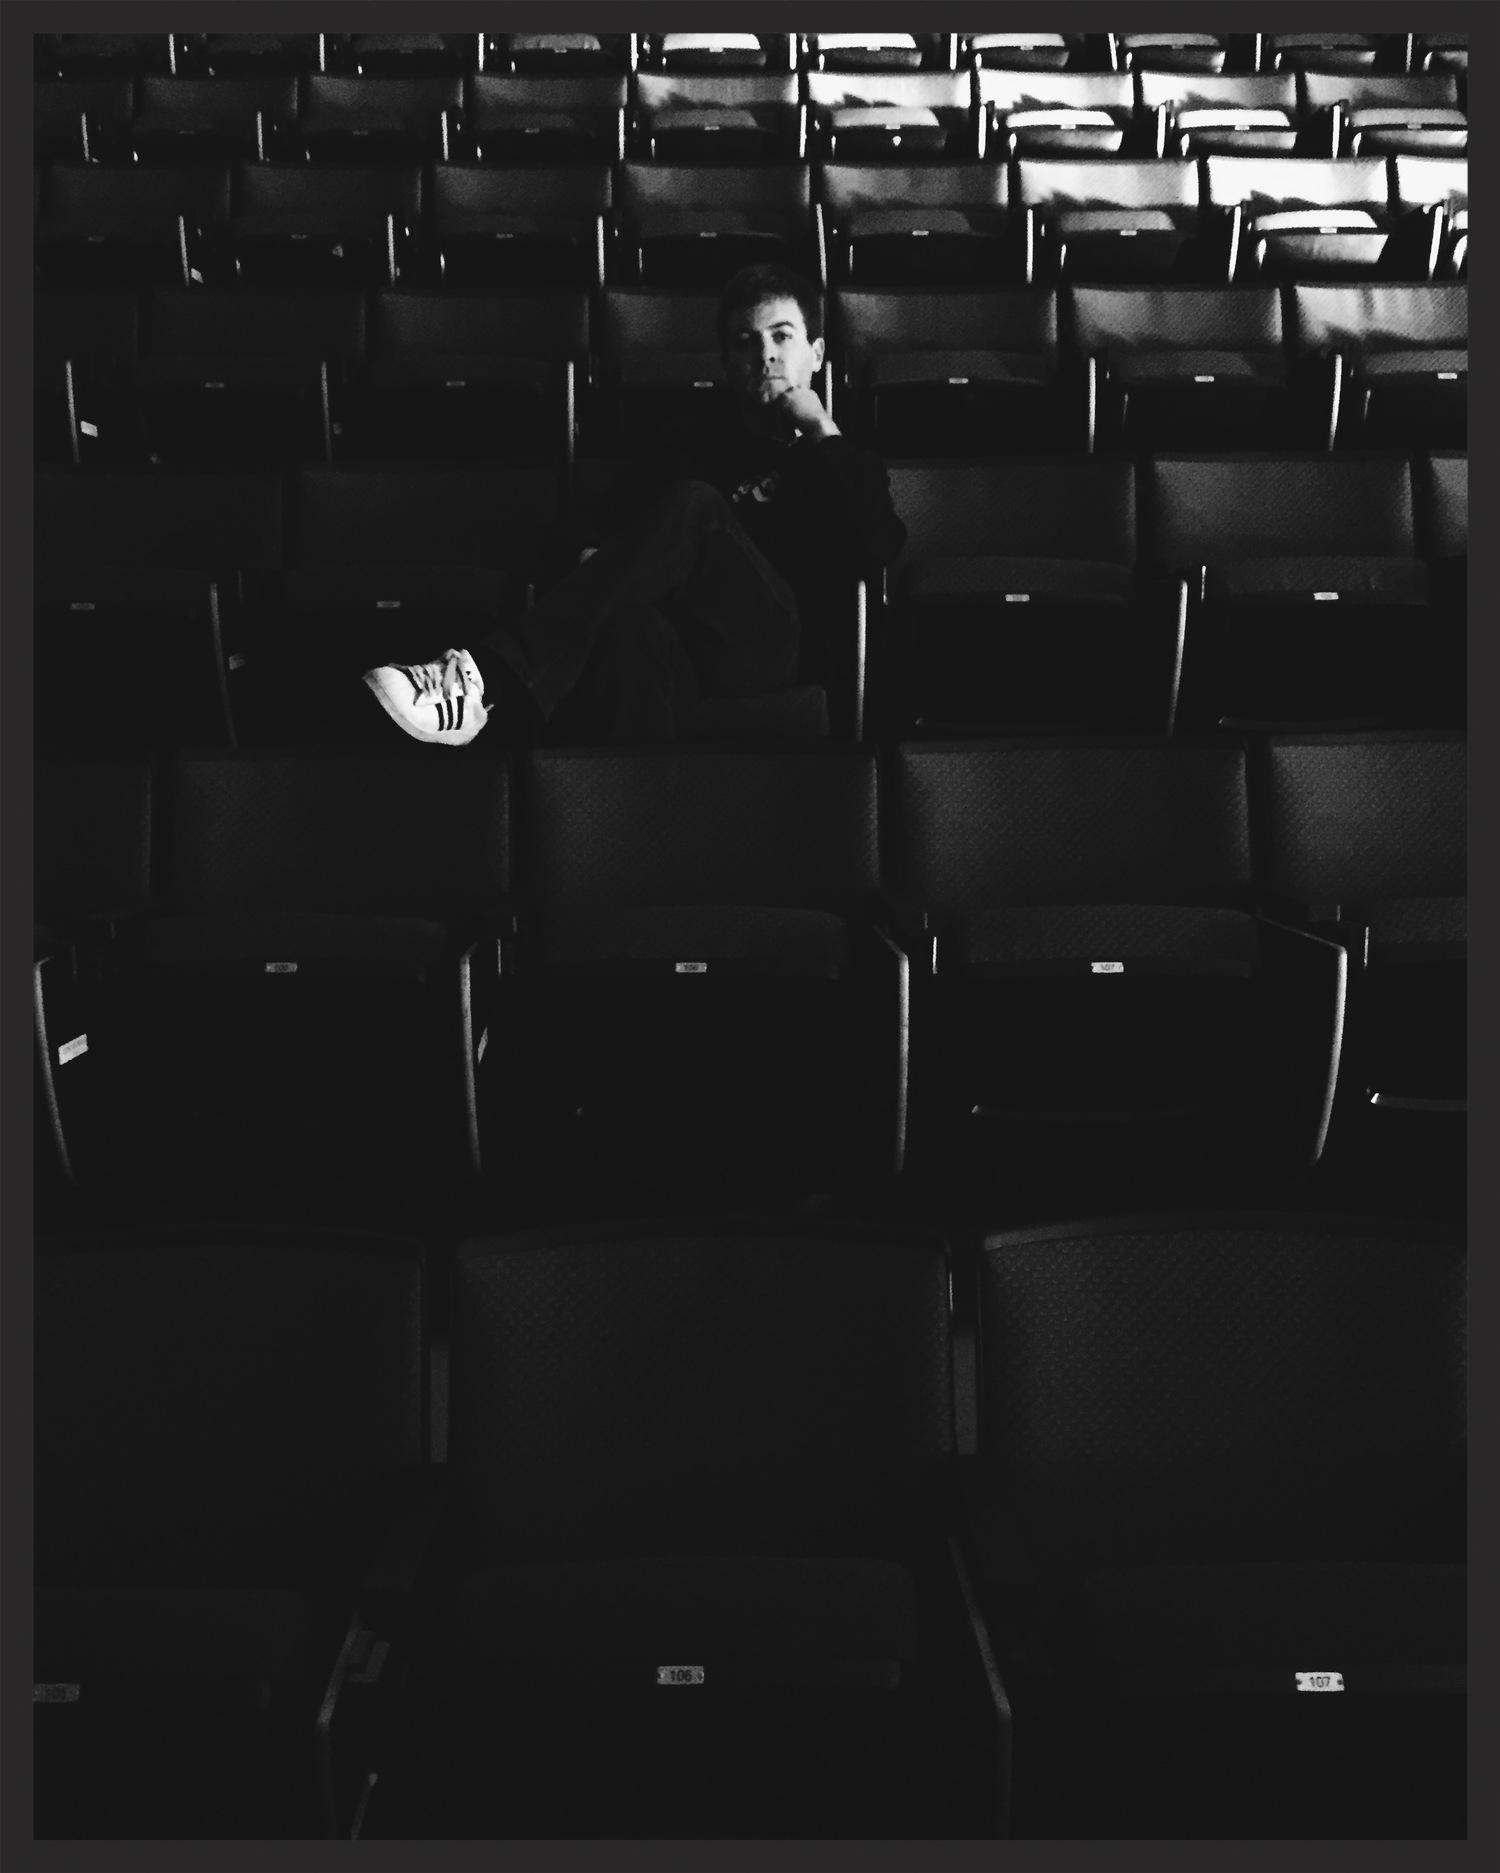 anders-larsson-empty-seats-sdsu-drummer-writer-san-diego.jpg